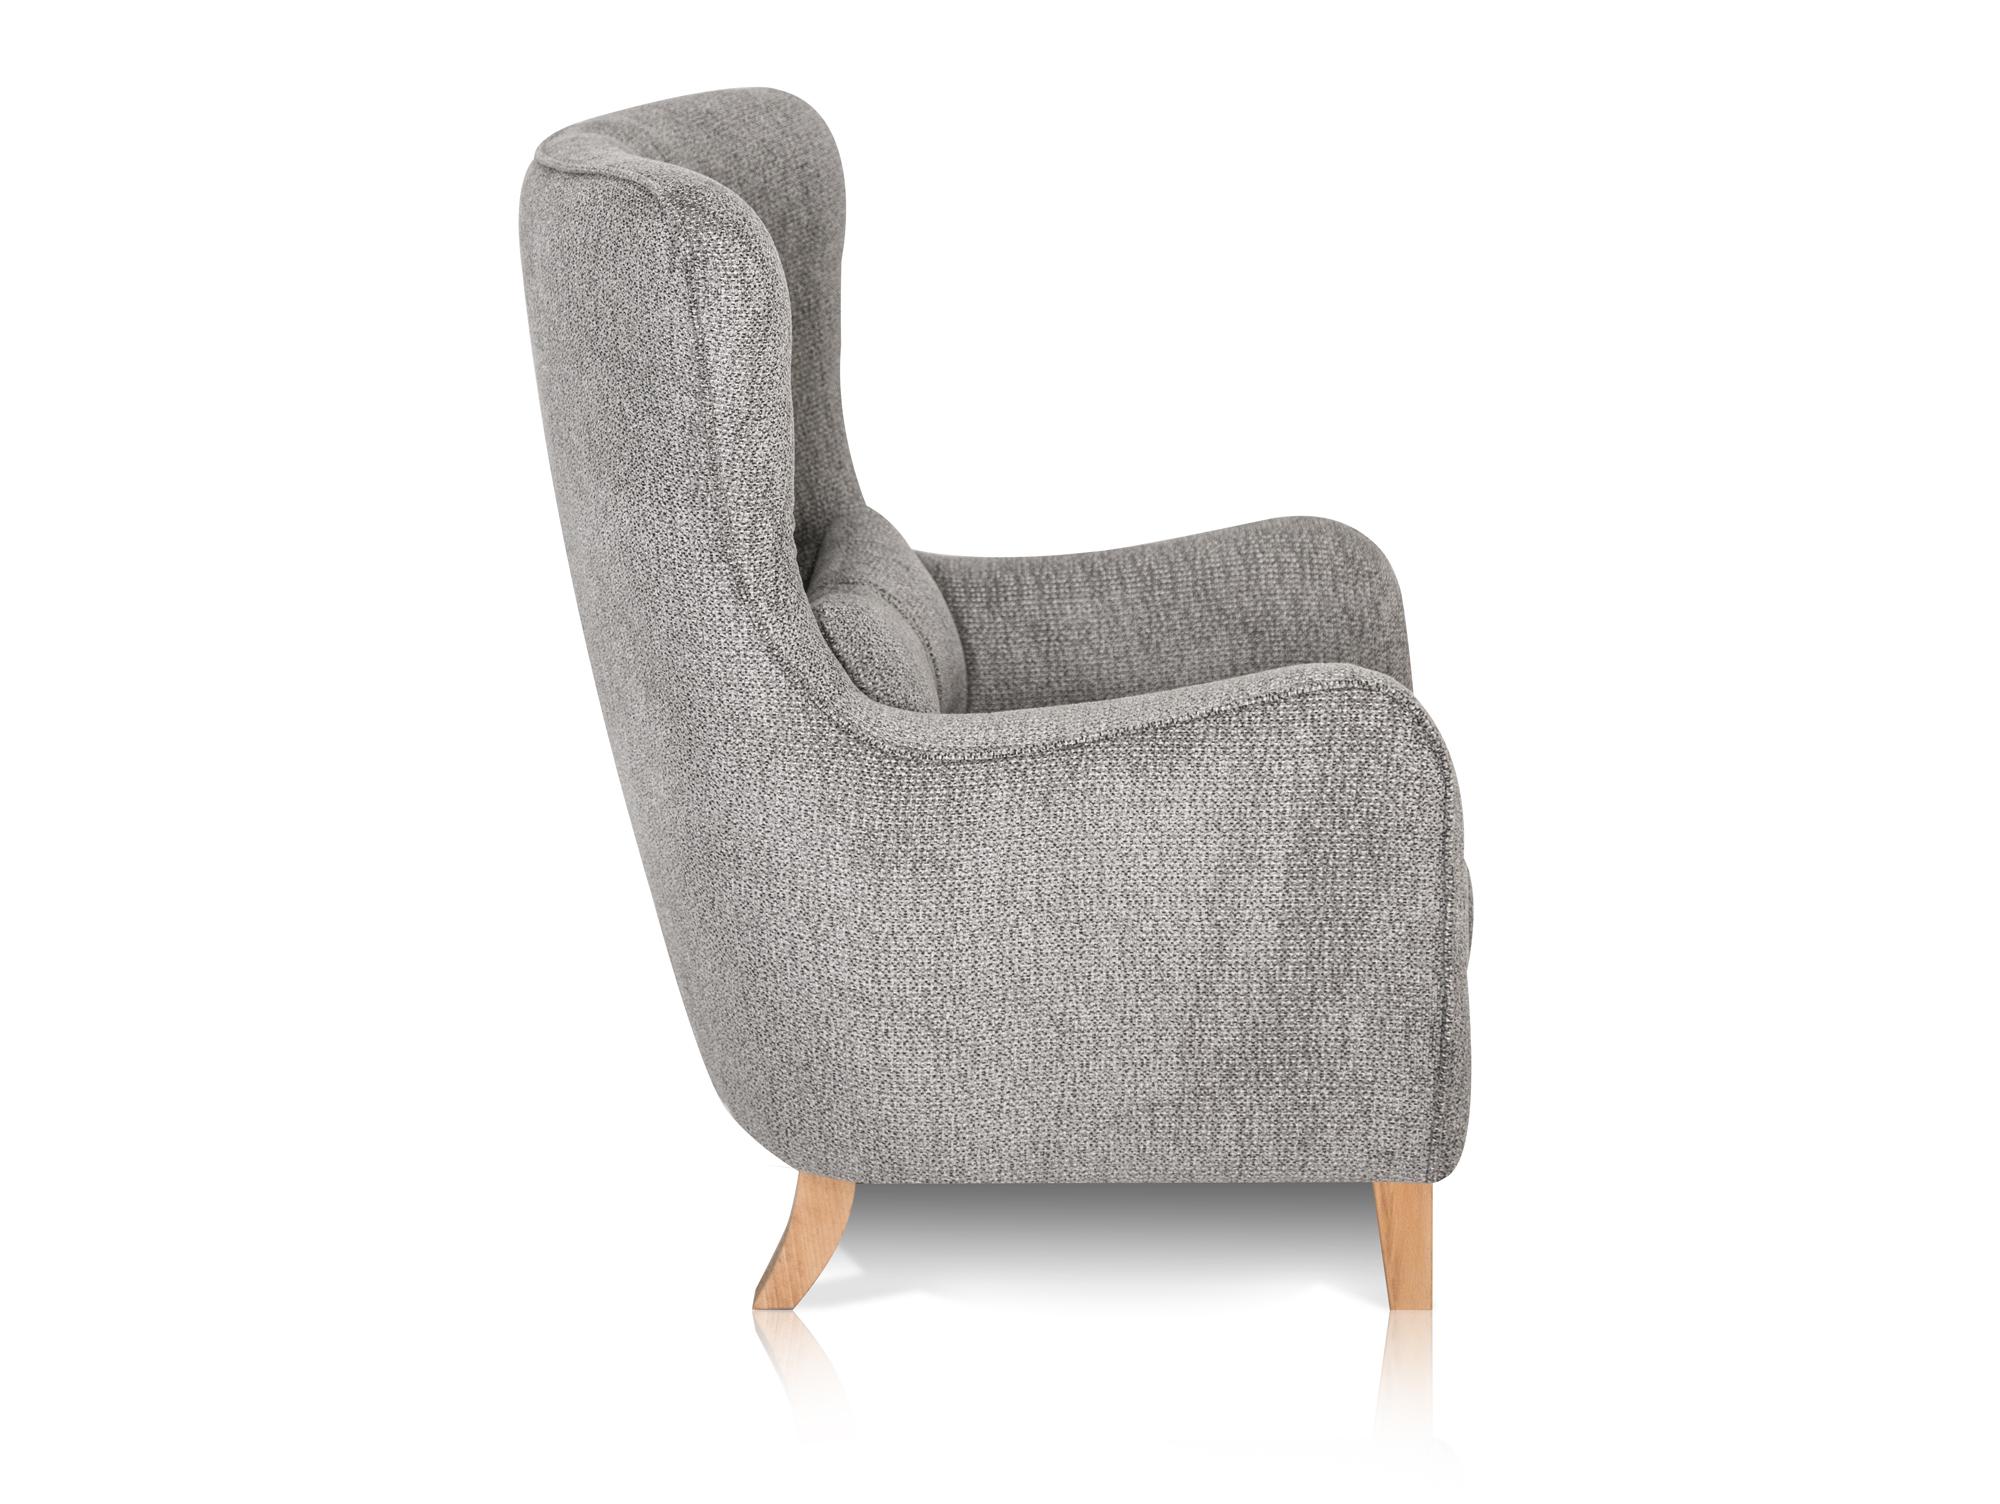 ohrensessel grau ohrensessel blau kariert gunstig bunt mitker grau sessel mit fr sessel mit. Black Bedroom Furniture Sets. Home Design Ideas